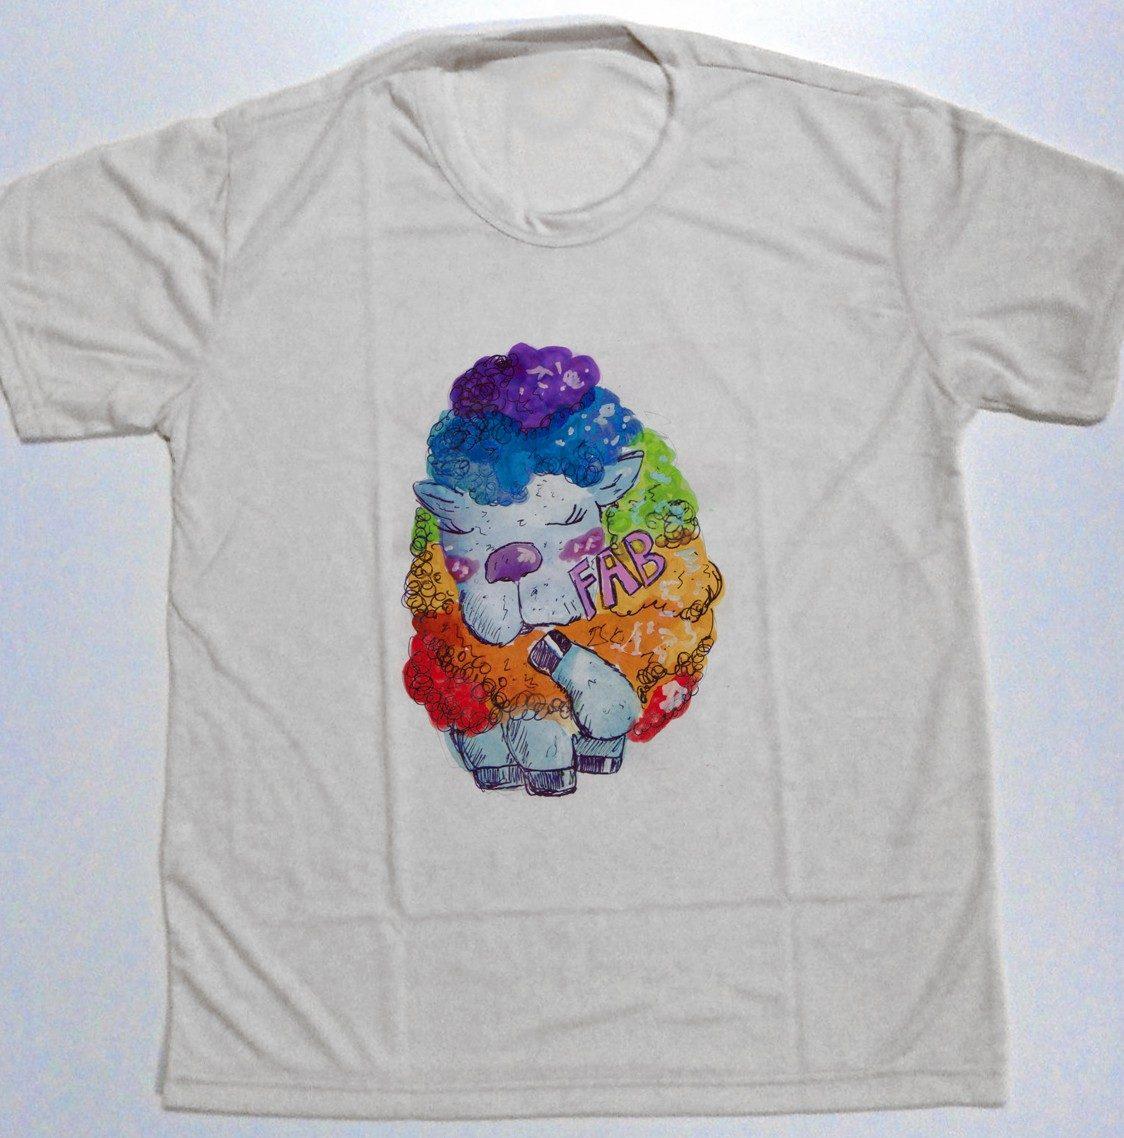 91b56de0f camiseta masculina ovelha arco-iris negra lgbt fab tumblr. Carregando zoom.